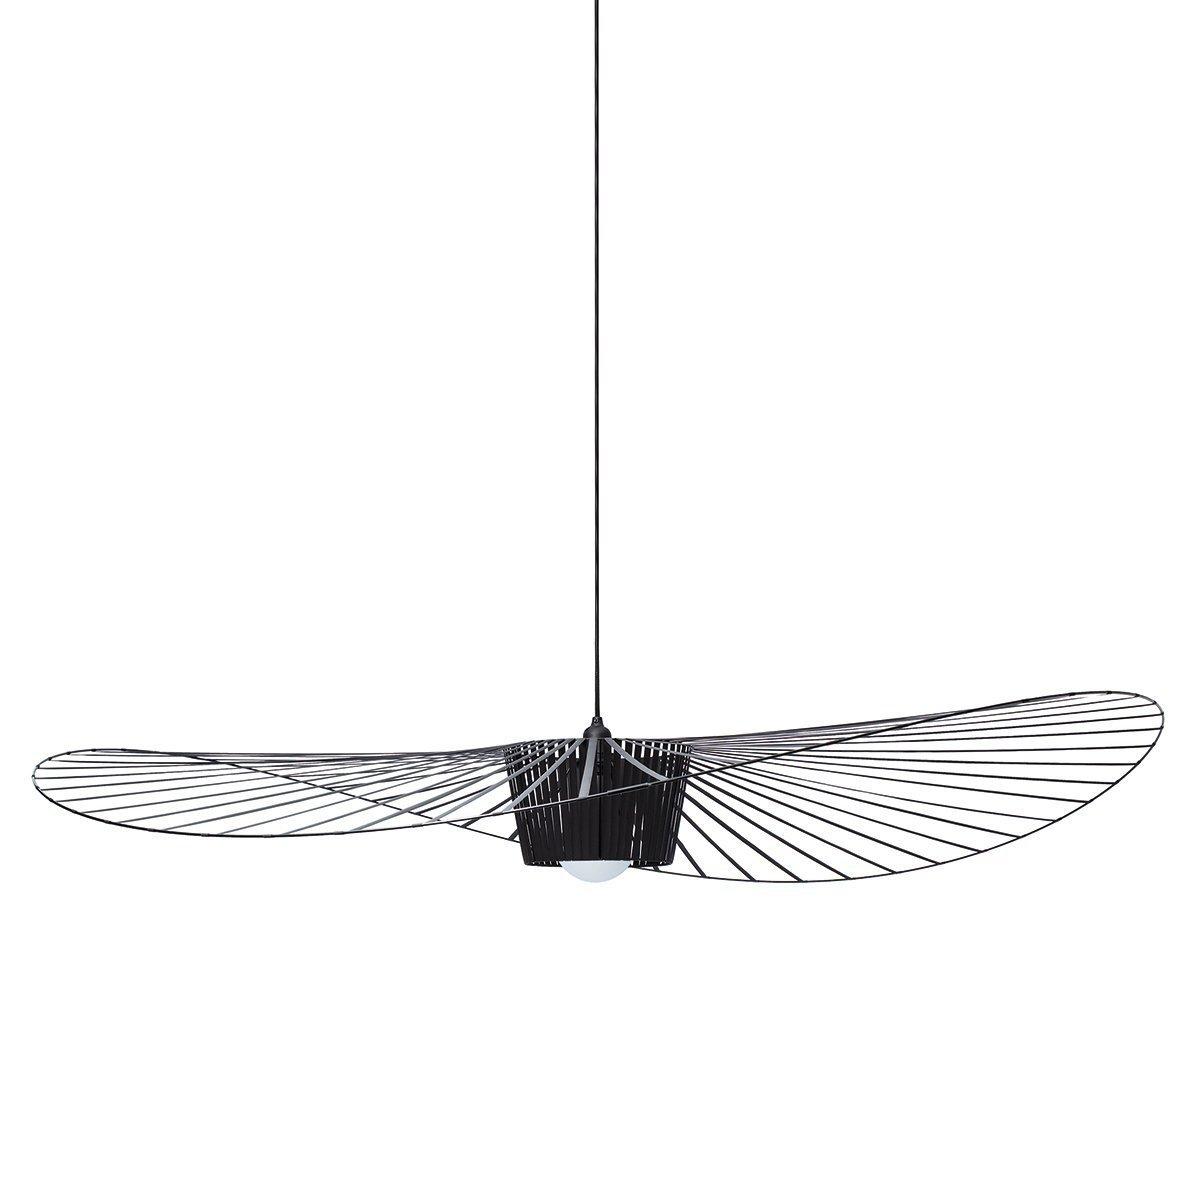 Vertigo Hanglamp Large - Petite Friture